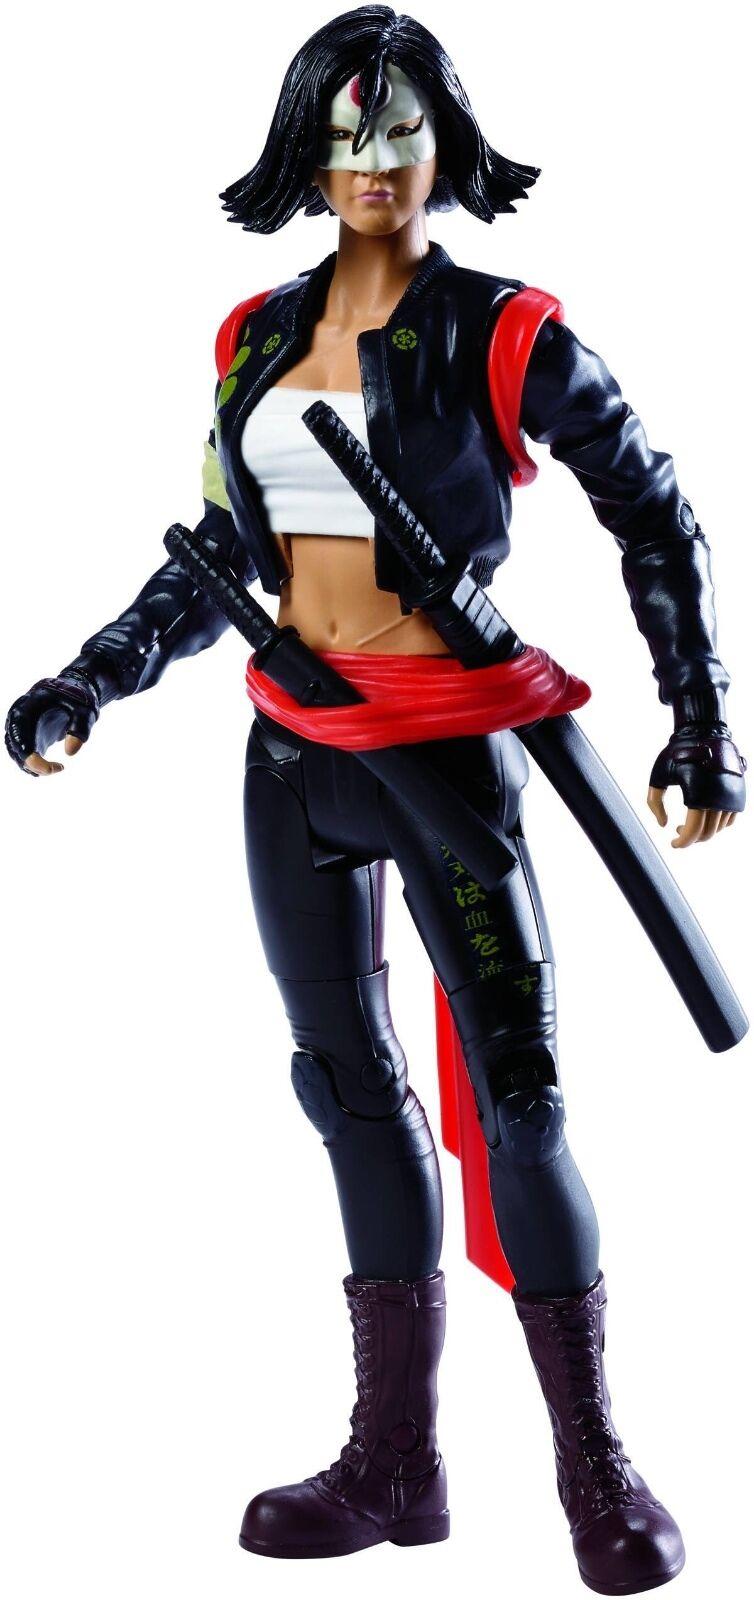 DC Multiverse Suicide Squad Katana Figure - 6'' 15 cm tall - Joker Harley Quinn